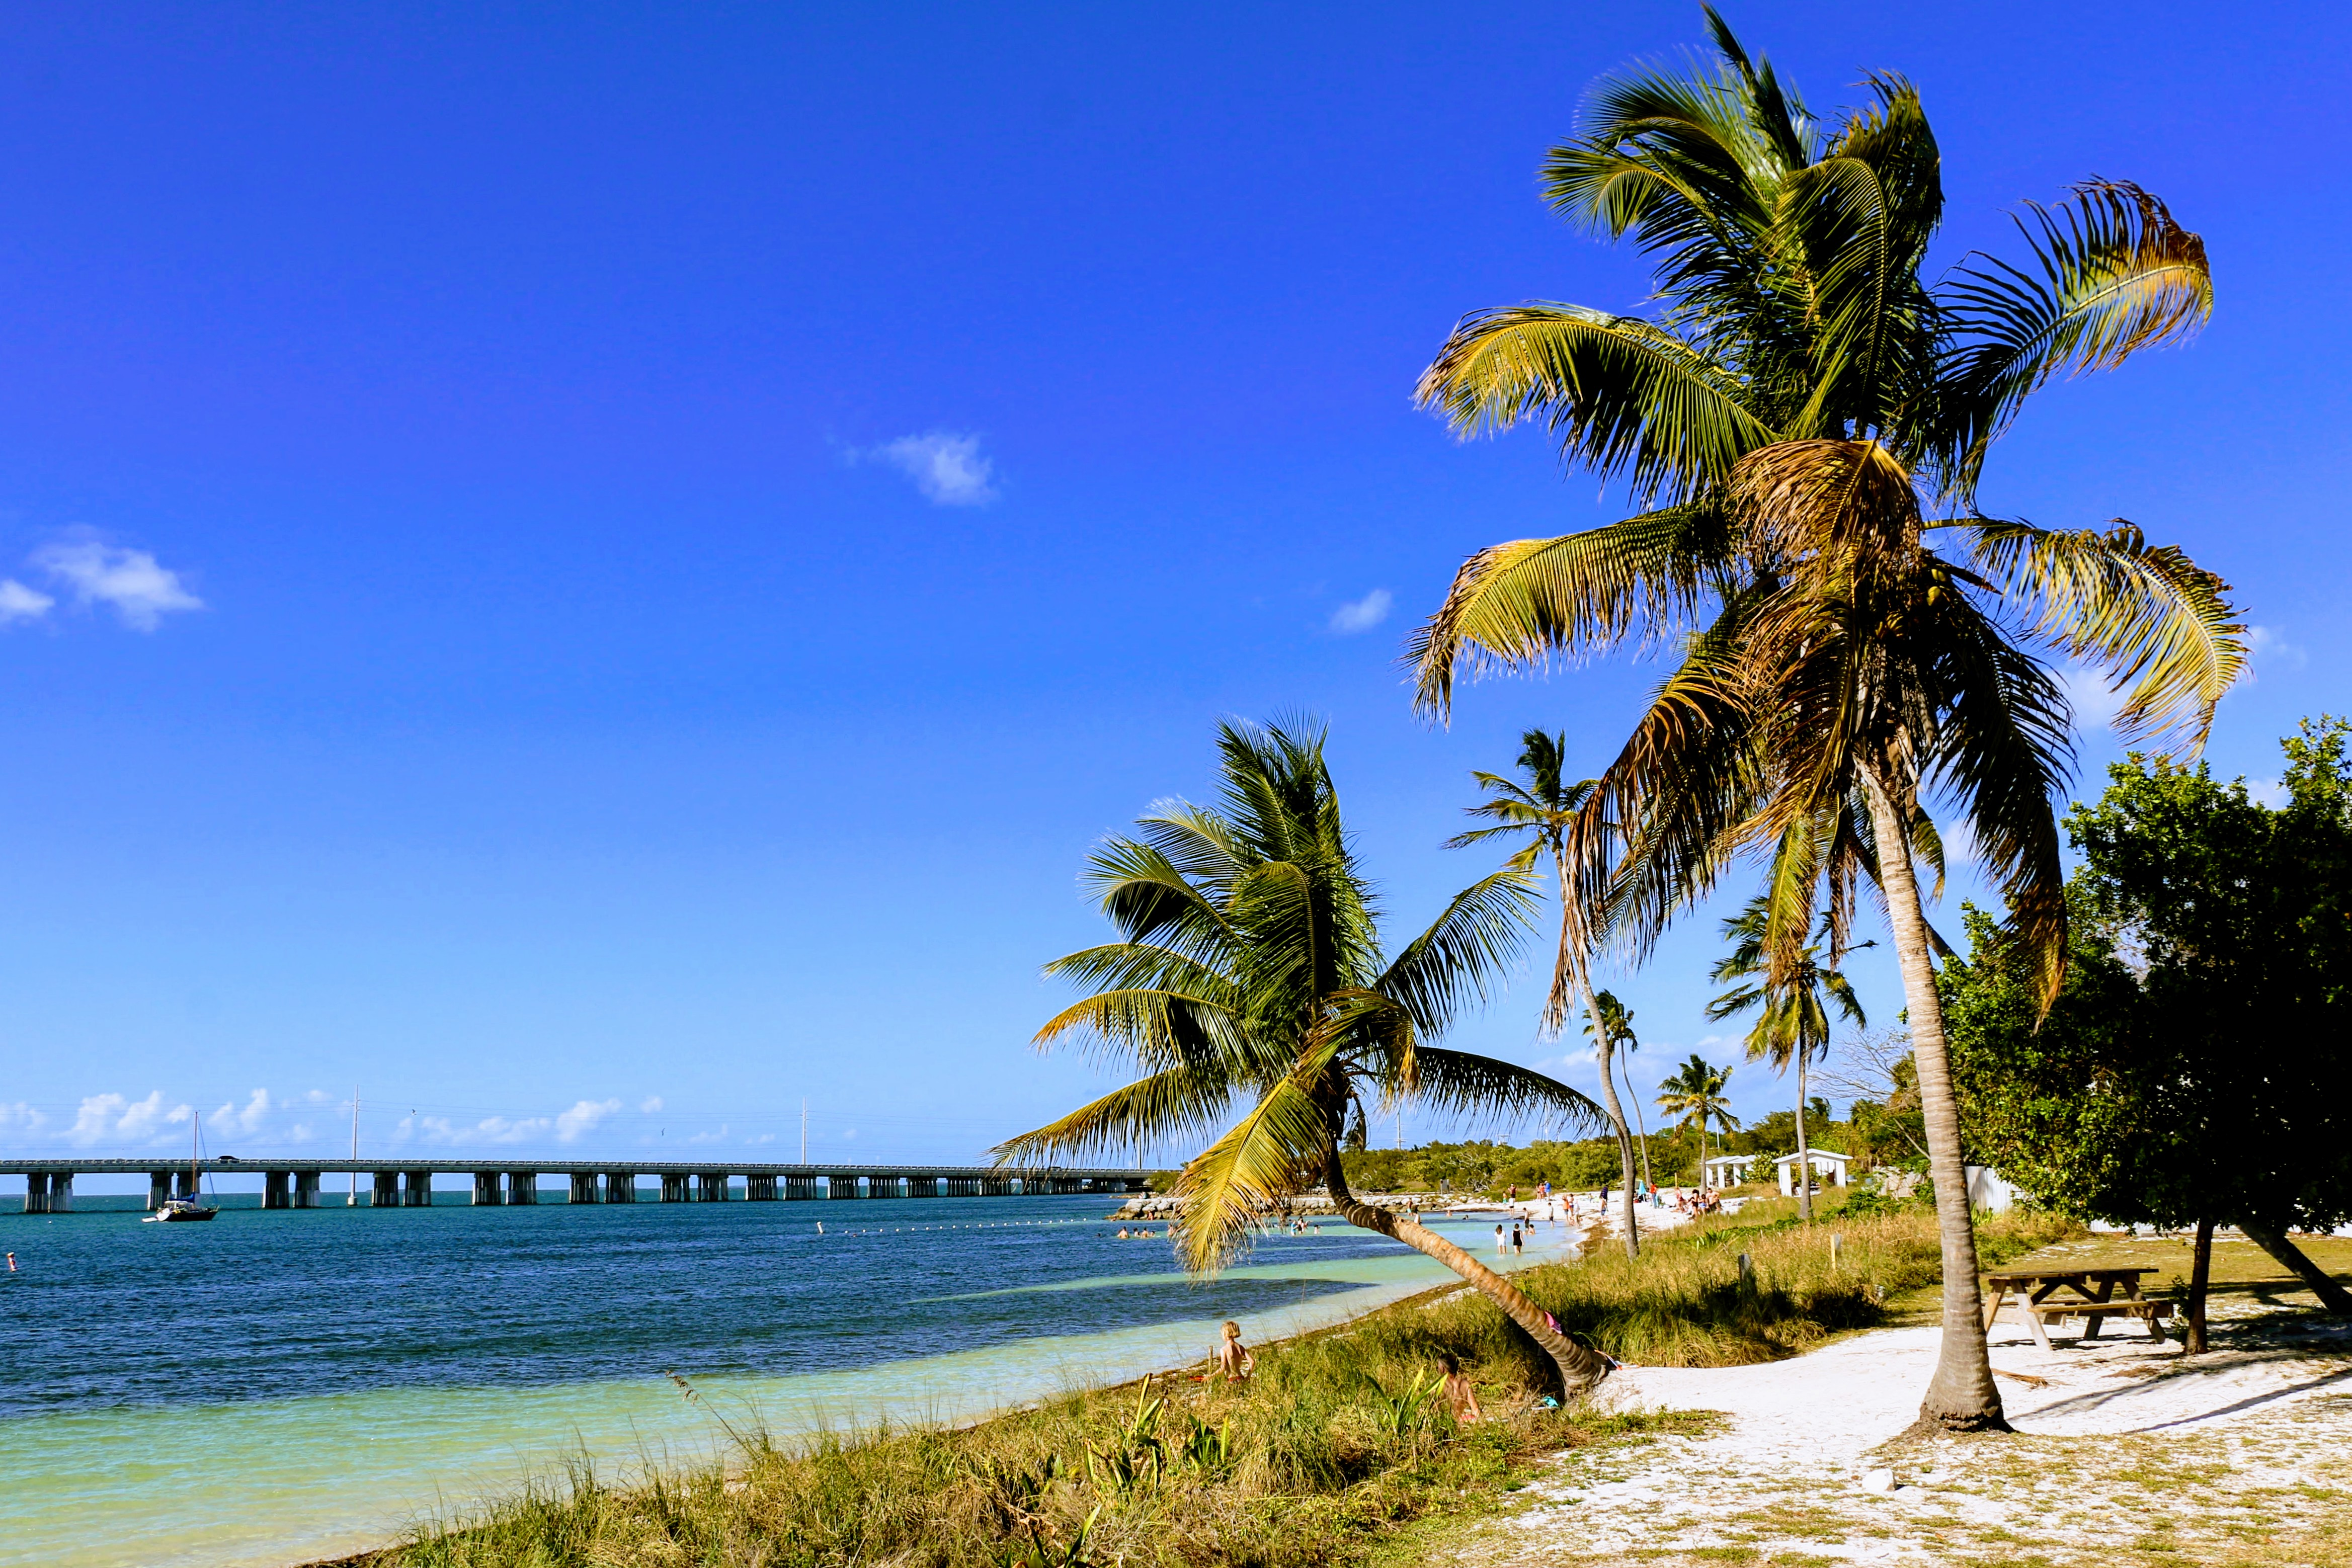 Reisverslag Florida Paasvakantie